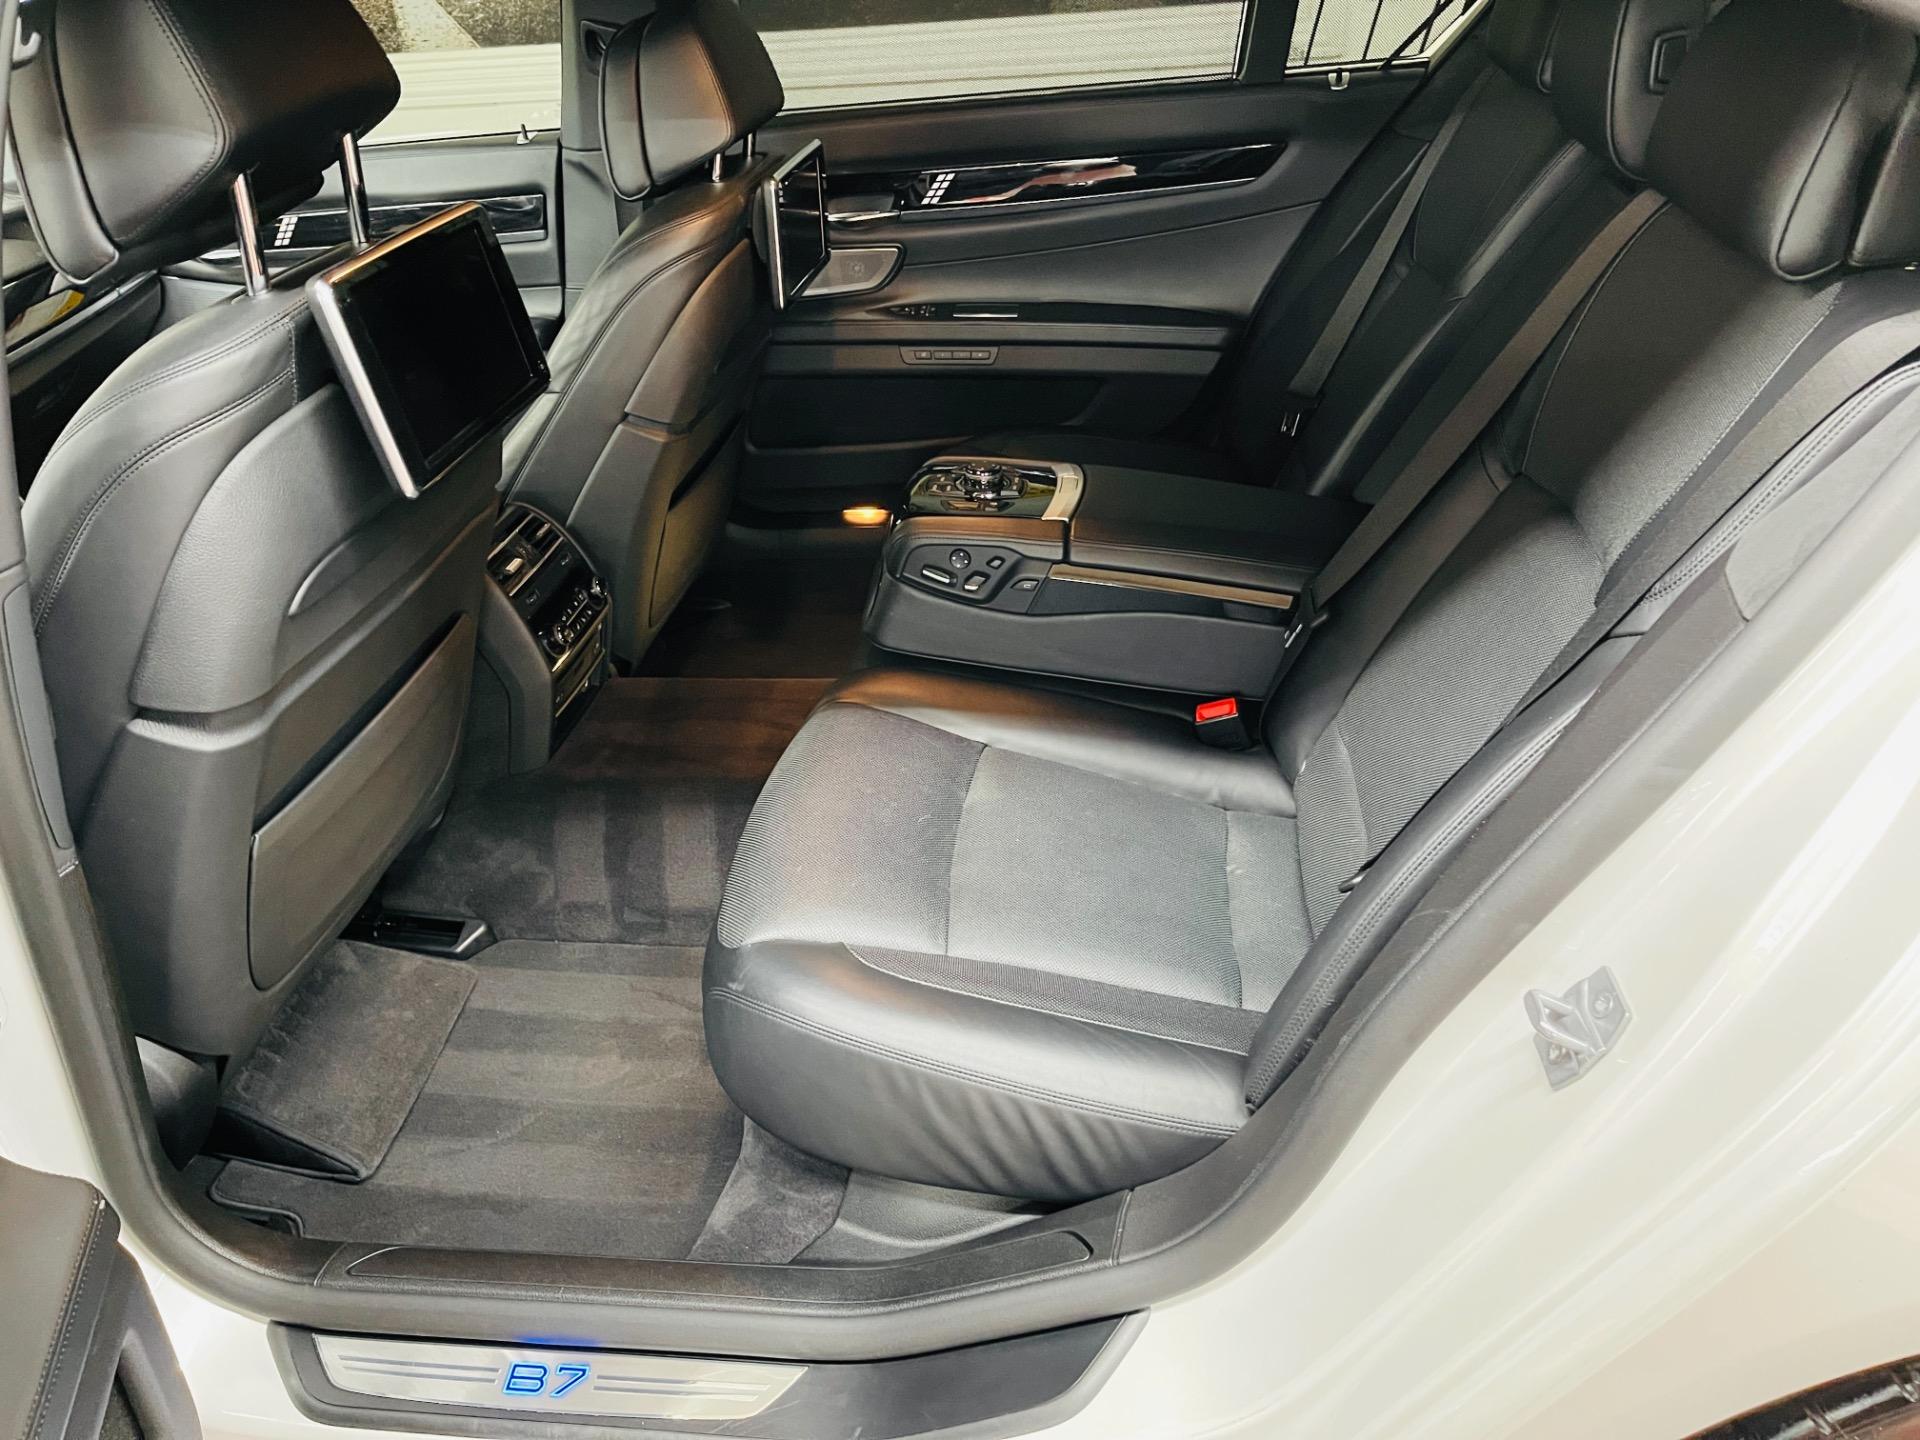 Used 2013 BMW 7 Series ALPINA B7 LWB xDrive - SEE VIDEO - | Mundelein, IL